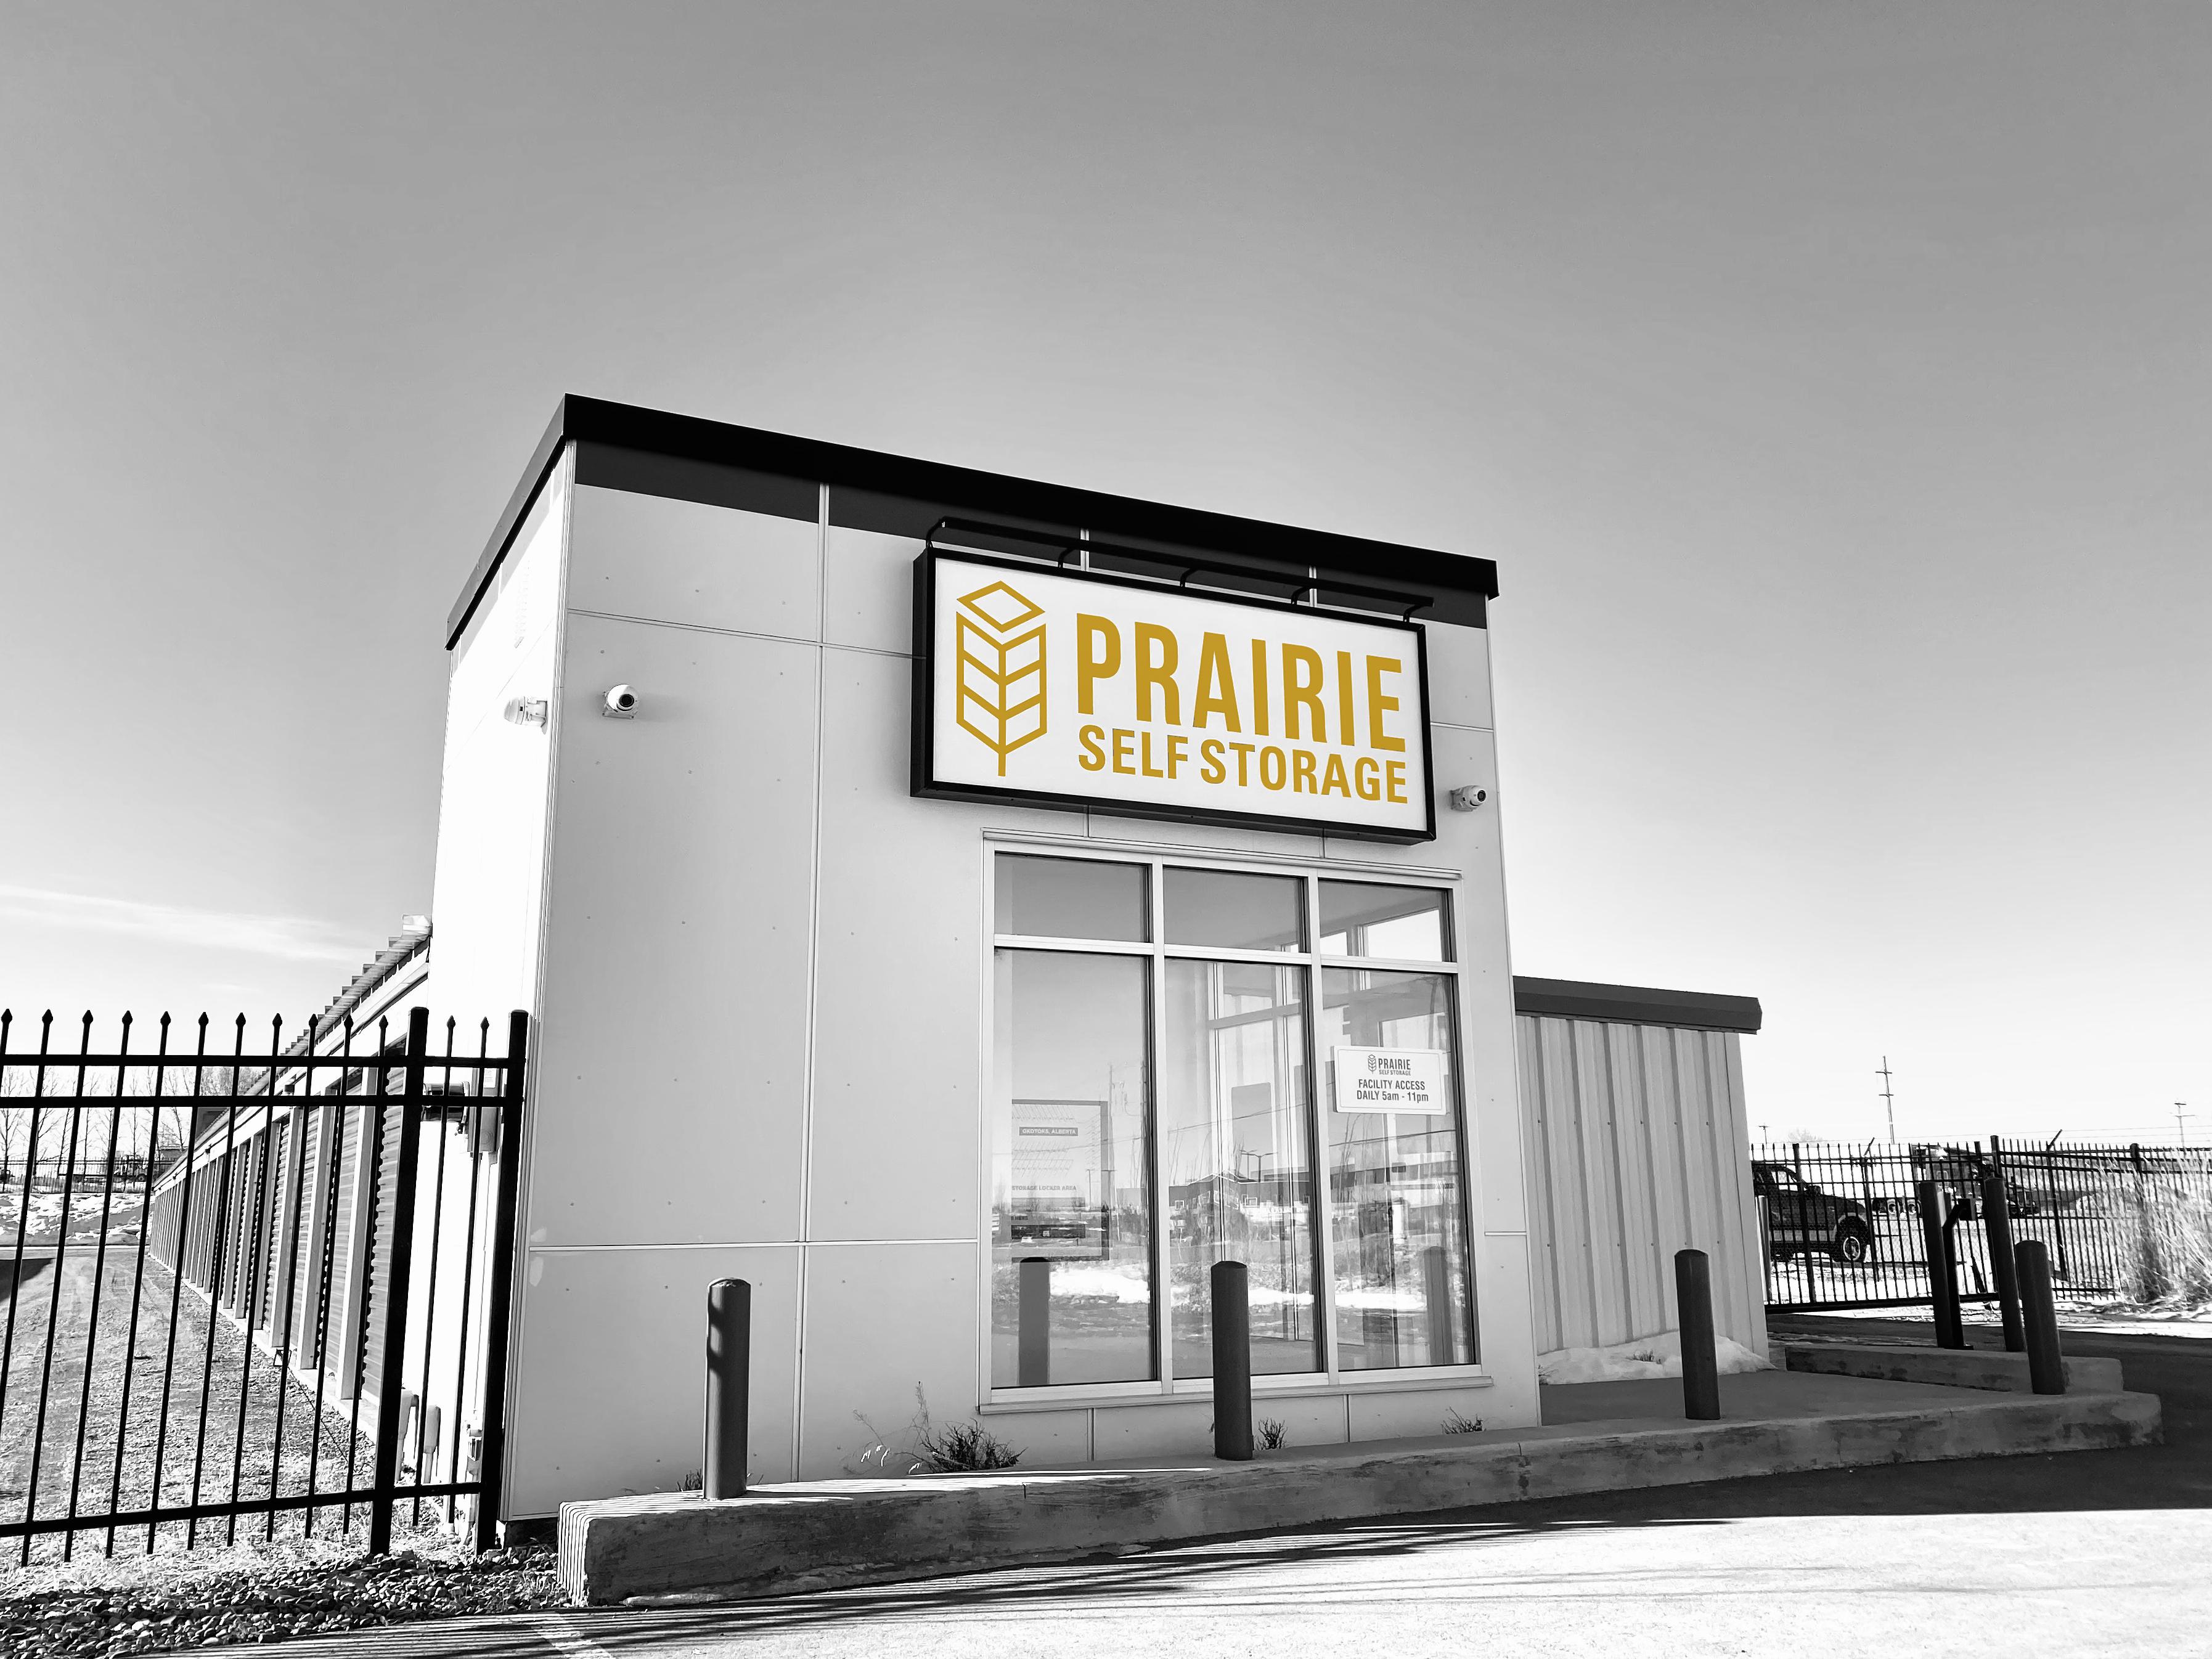 Prairie Self Storage